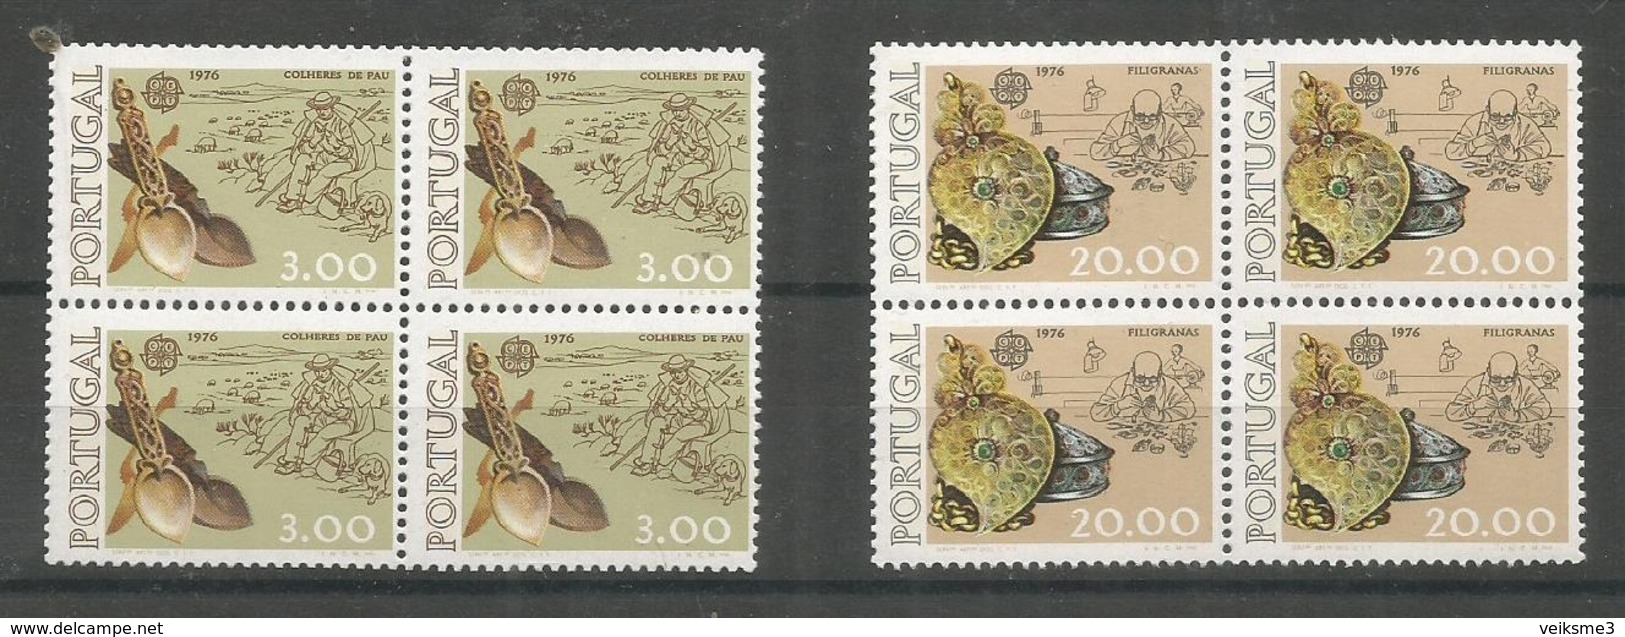 4x PORTUGAL - MNH - Europa-CEPT - Art - 1976 - Europa-CEPT